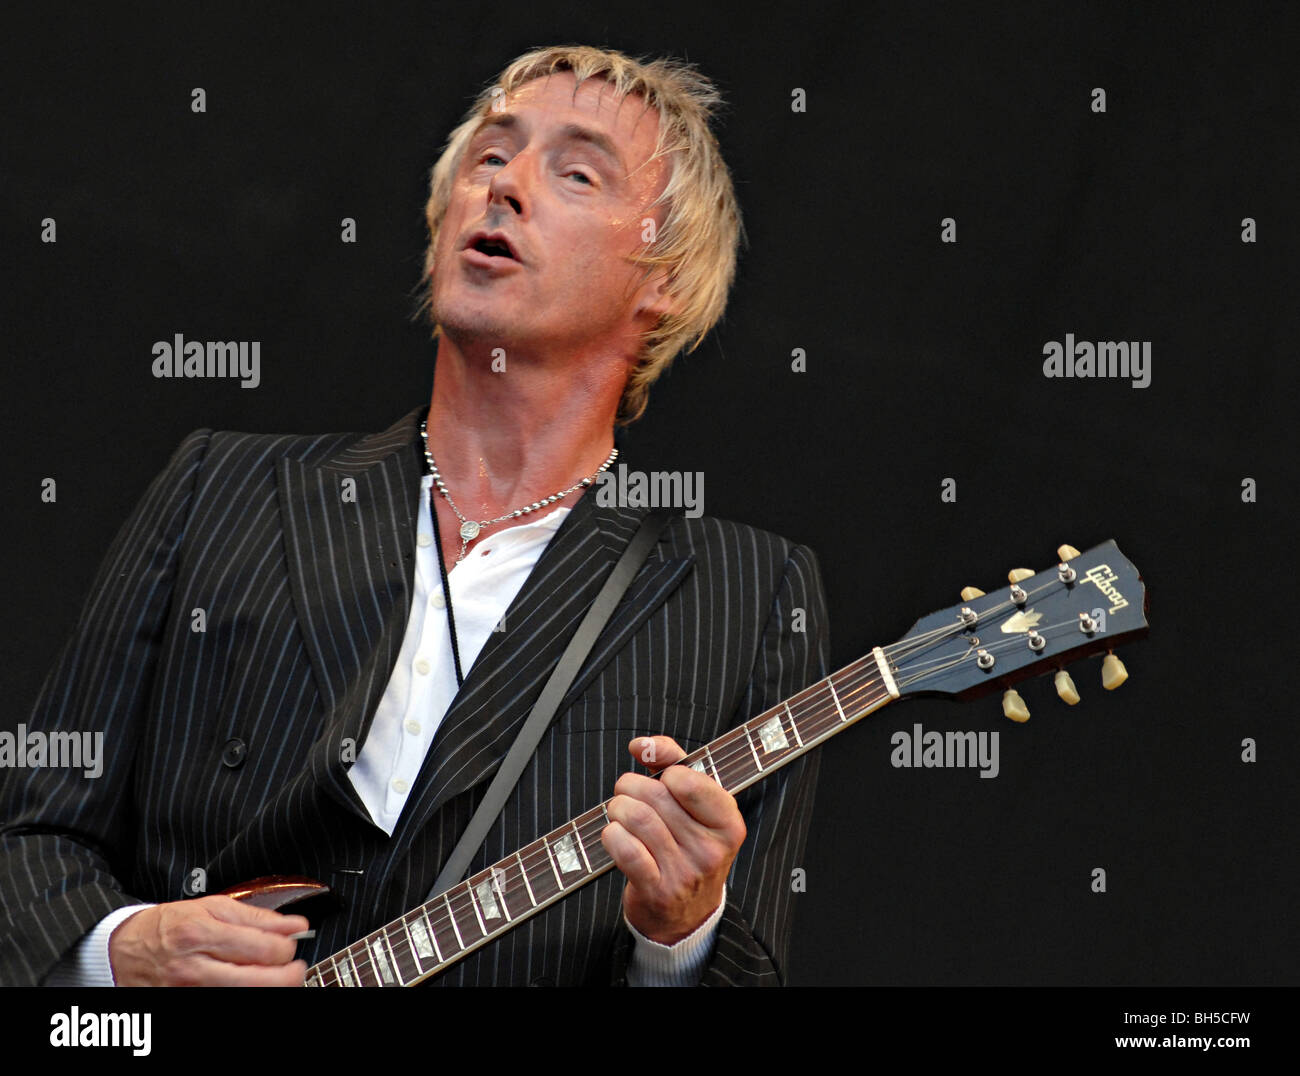 UK. Paul Weller playing in London - Stock Image